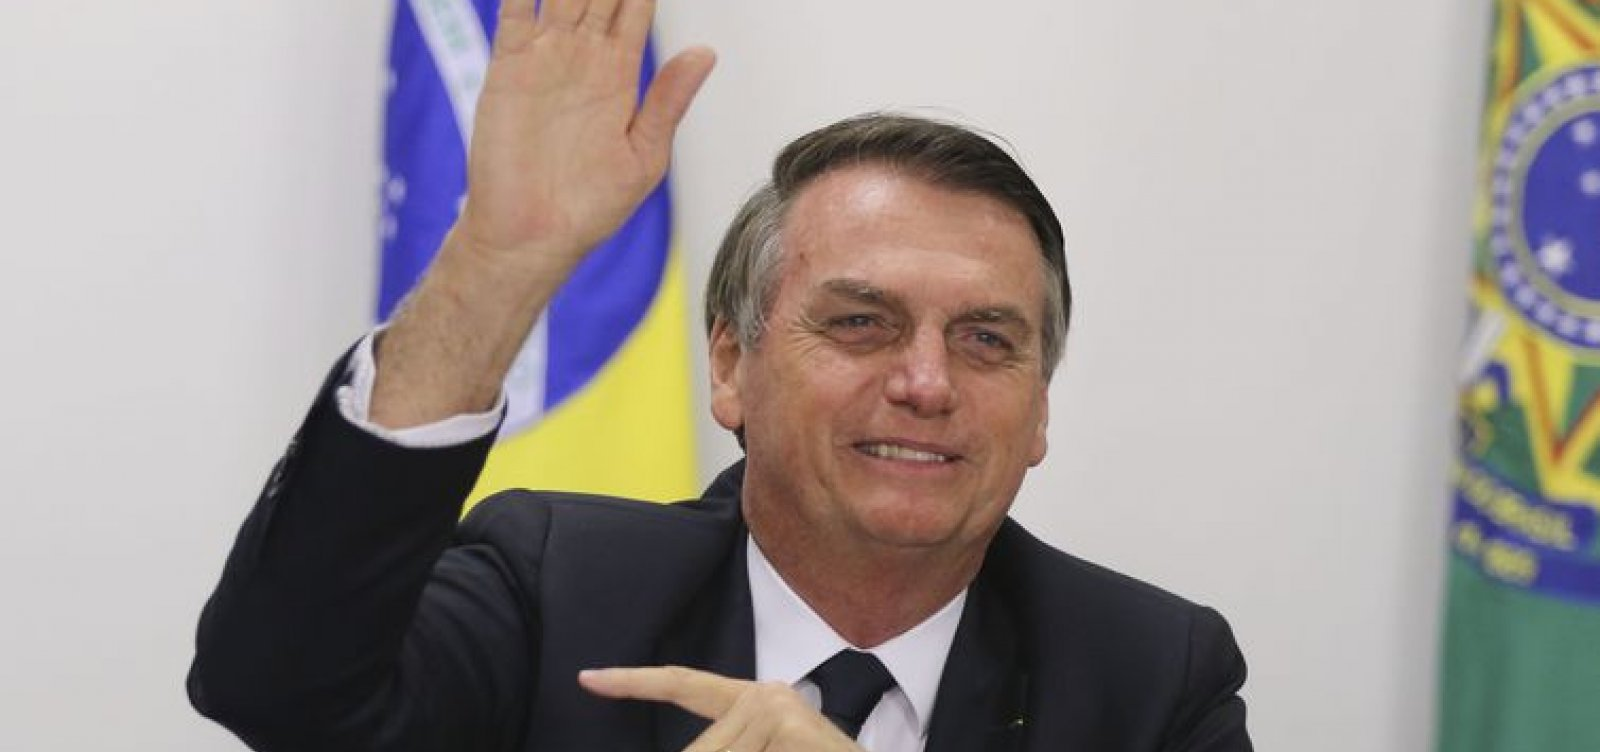 [Bolsonaro diz que tabela do Imposto de Renda será corrigida]